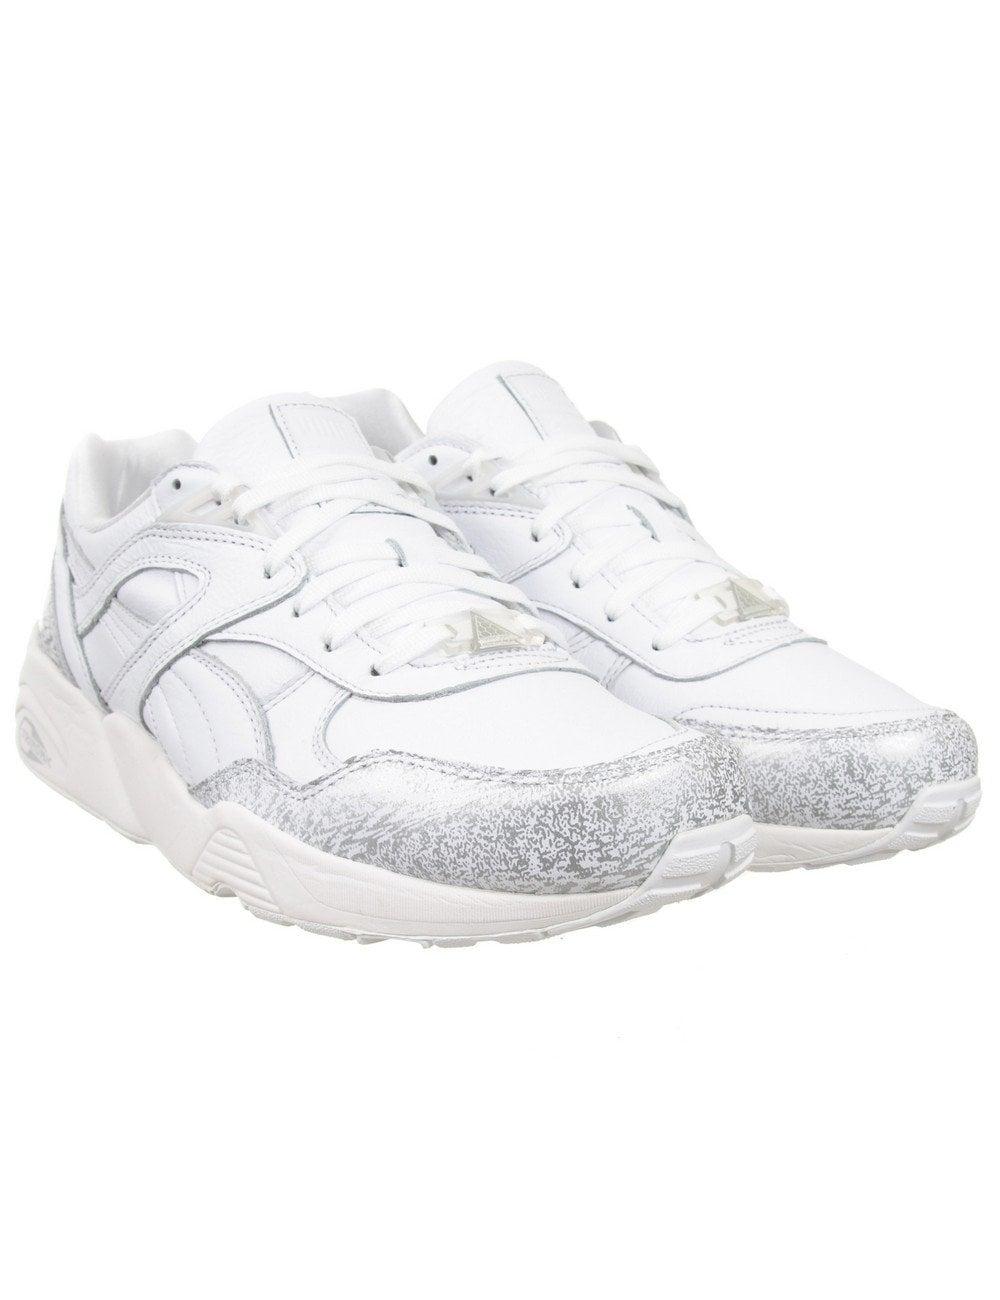 puma r698 white on white Sale c1c47f277